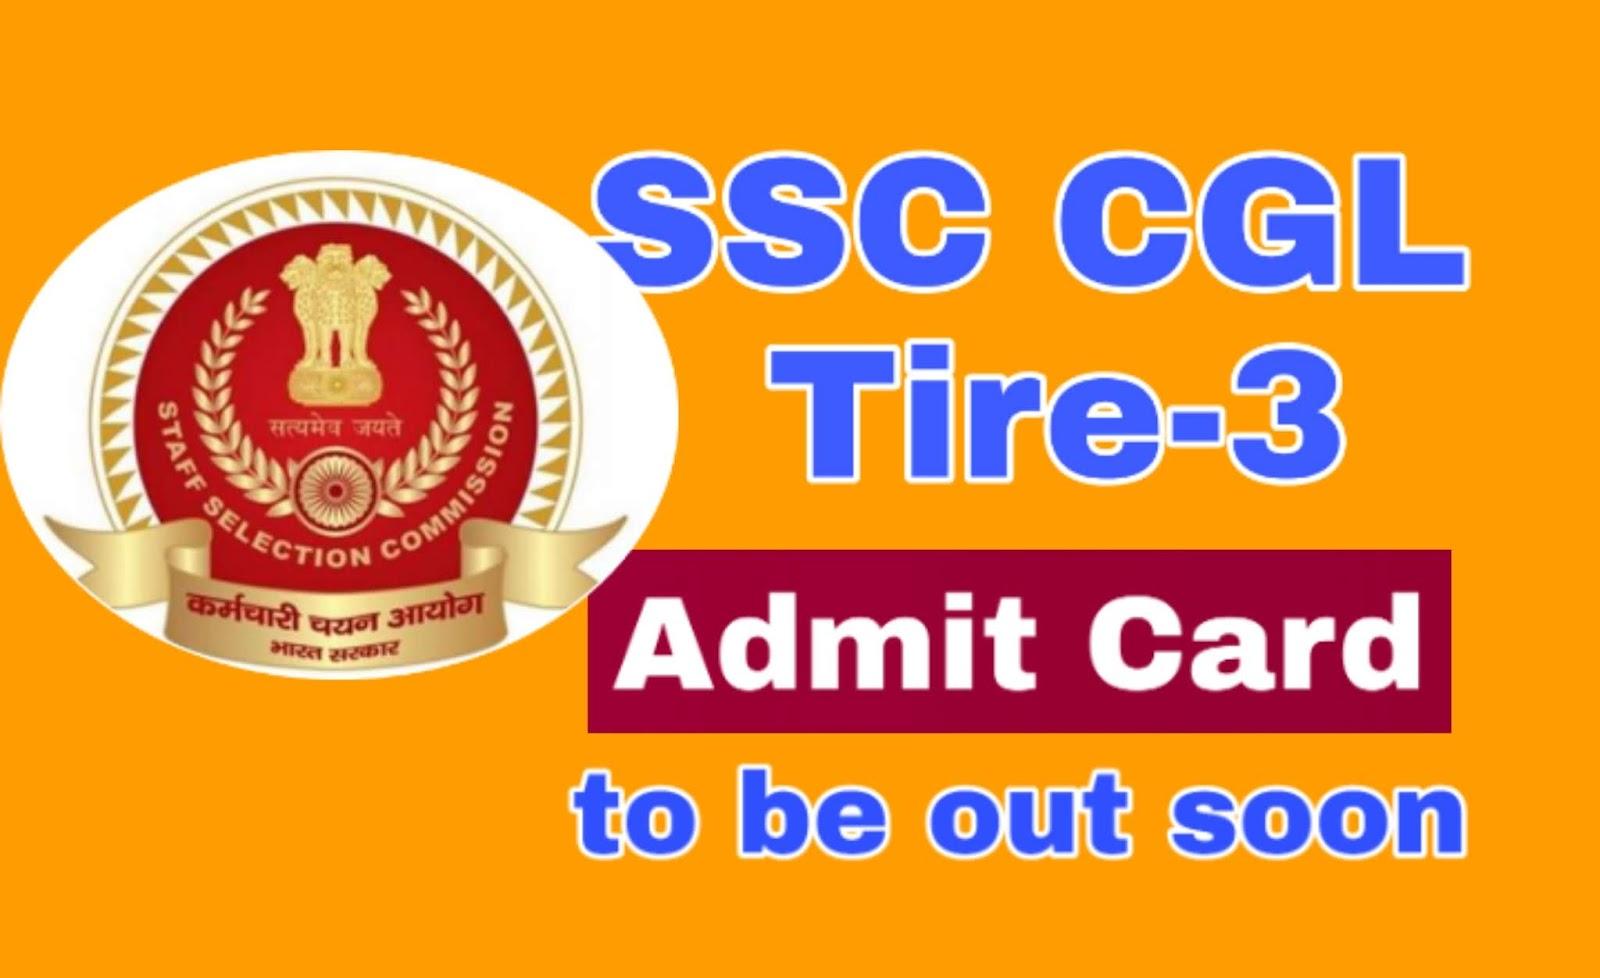 SSC CGL Tier 3 Admit Card: Check Exam City